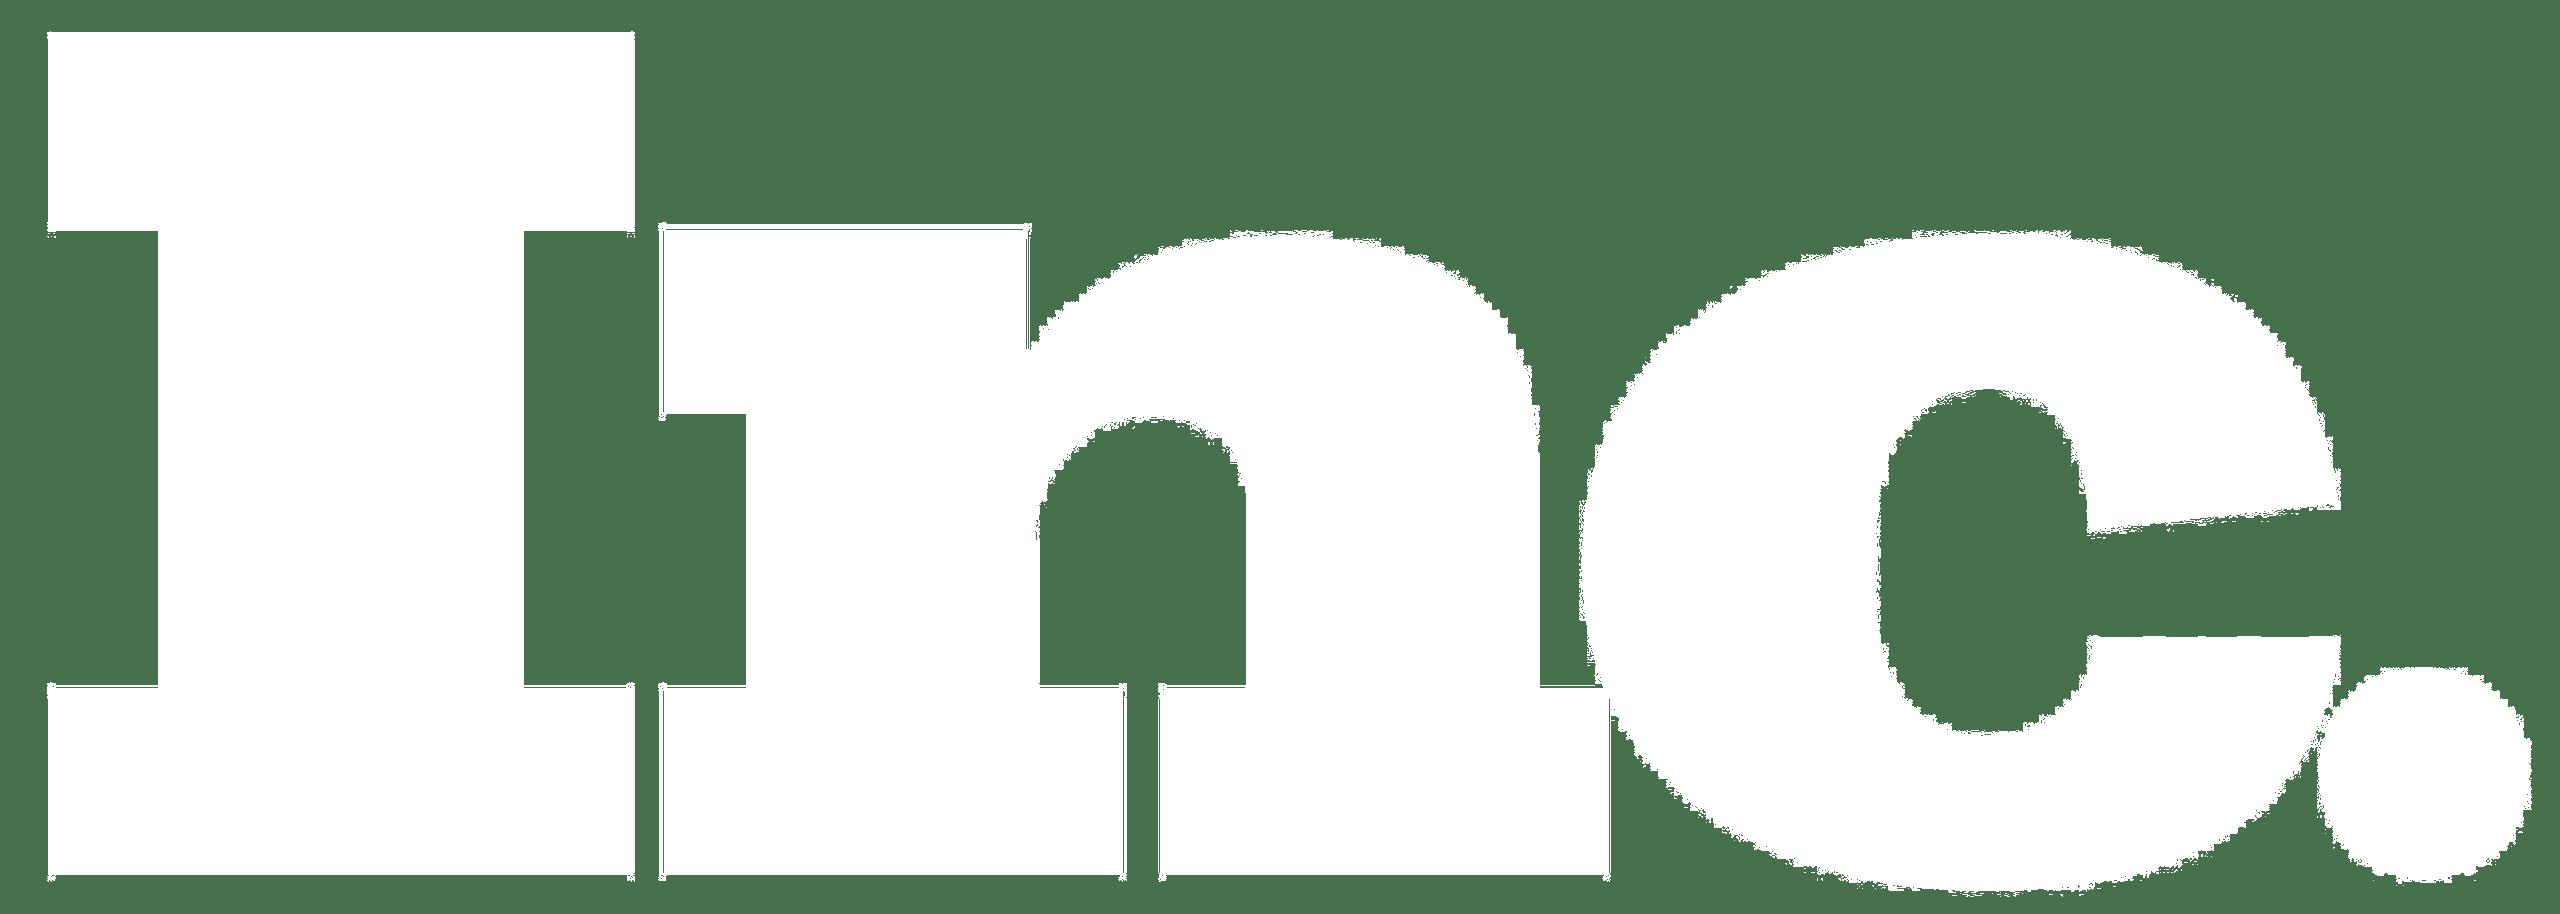 ina-article-una